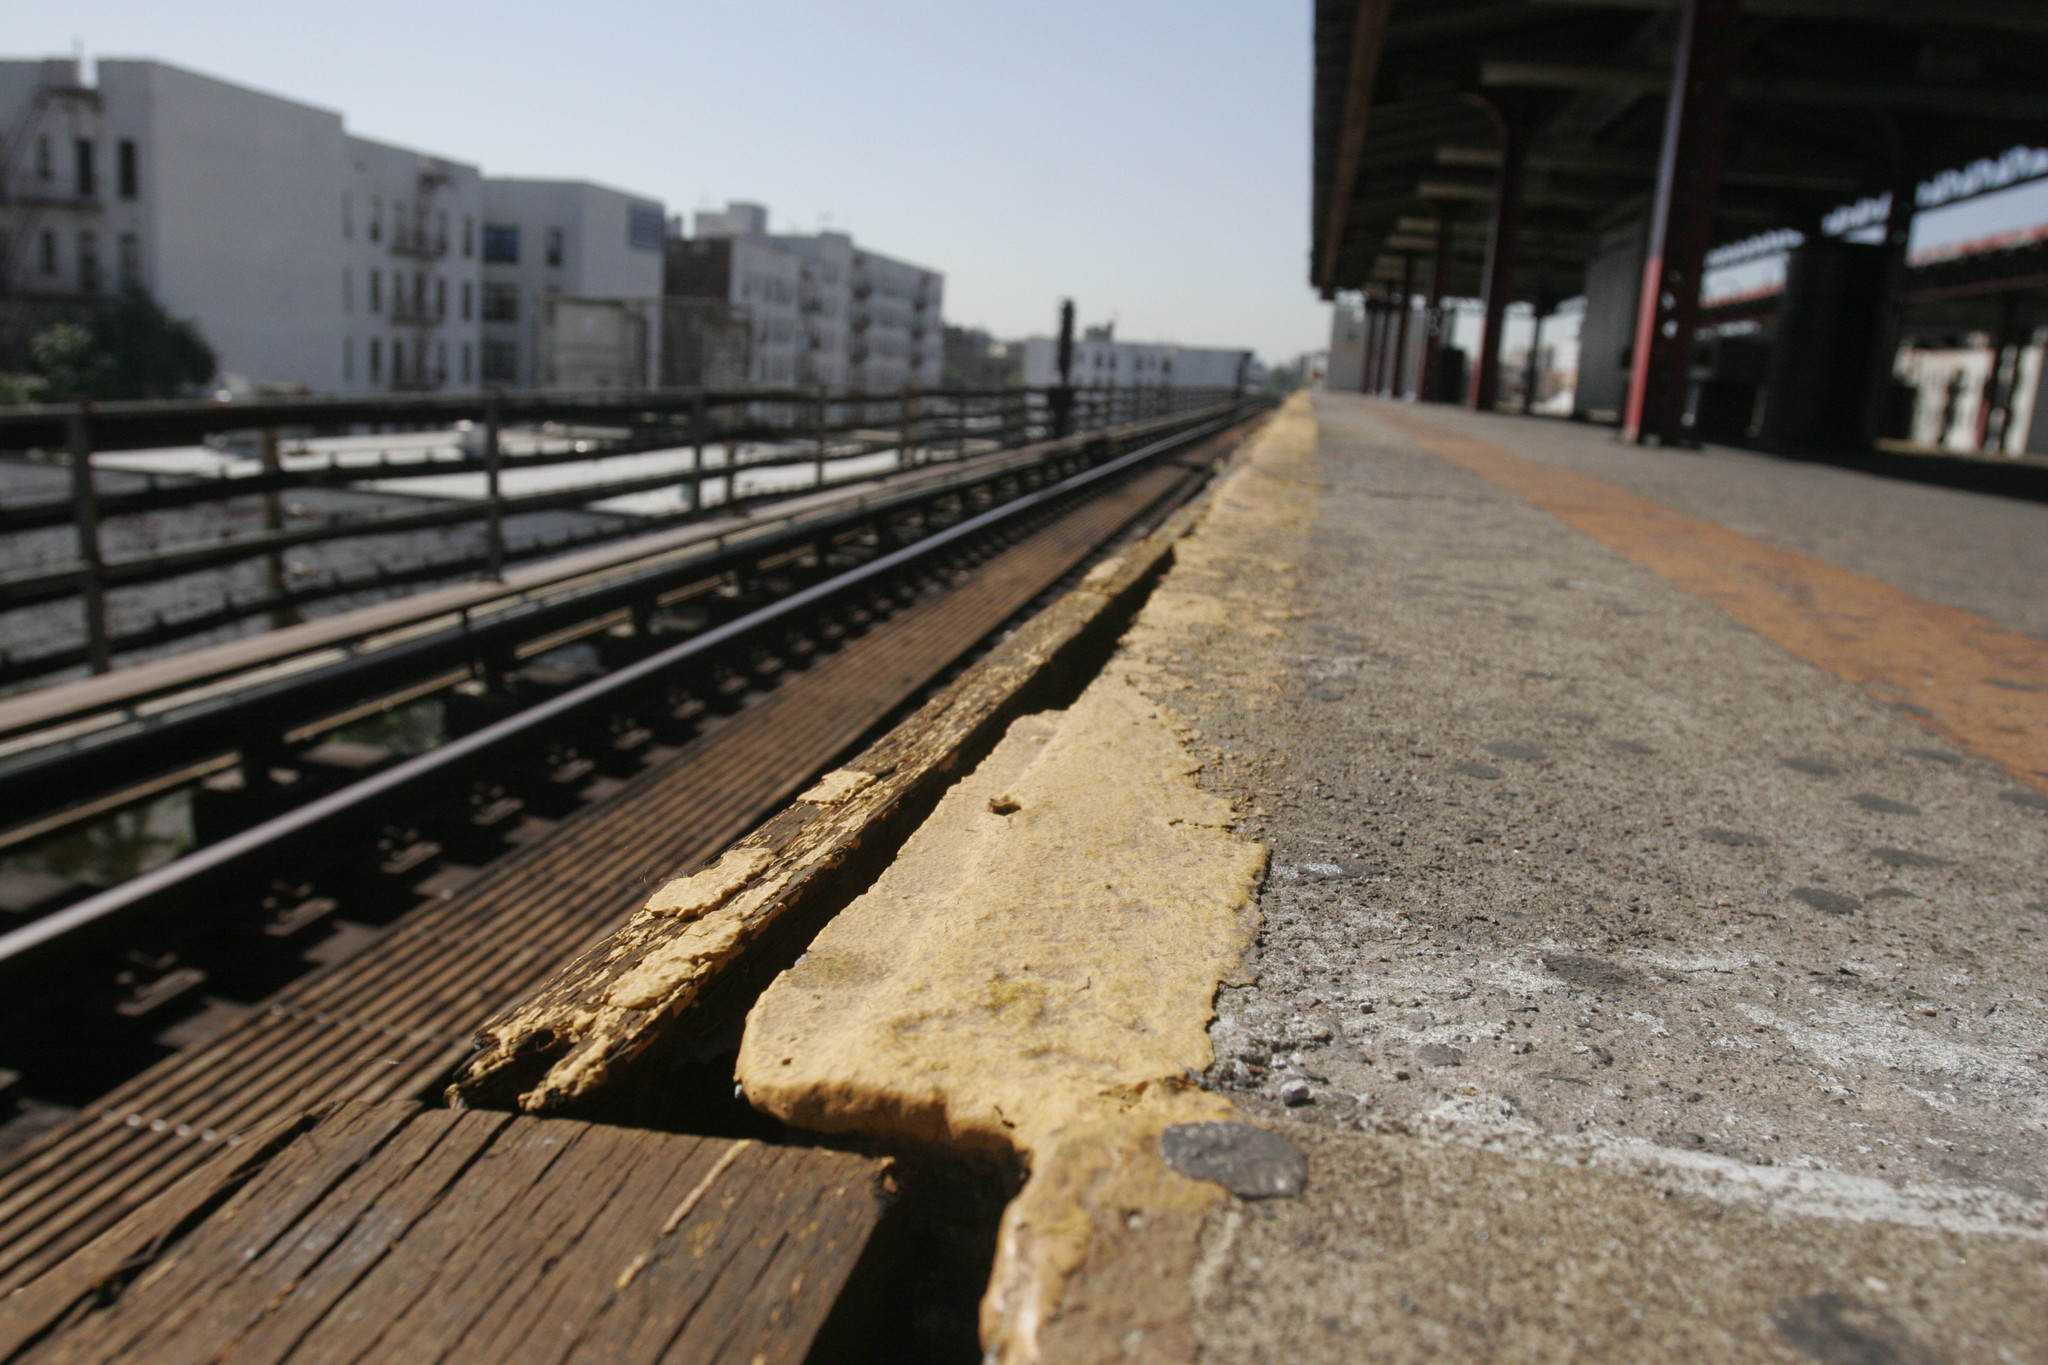 Cold hearted dad abandons tot on Bronx platform, good Samaritan saves the day